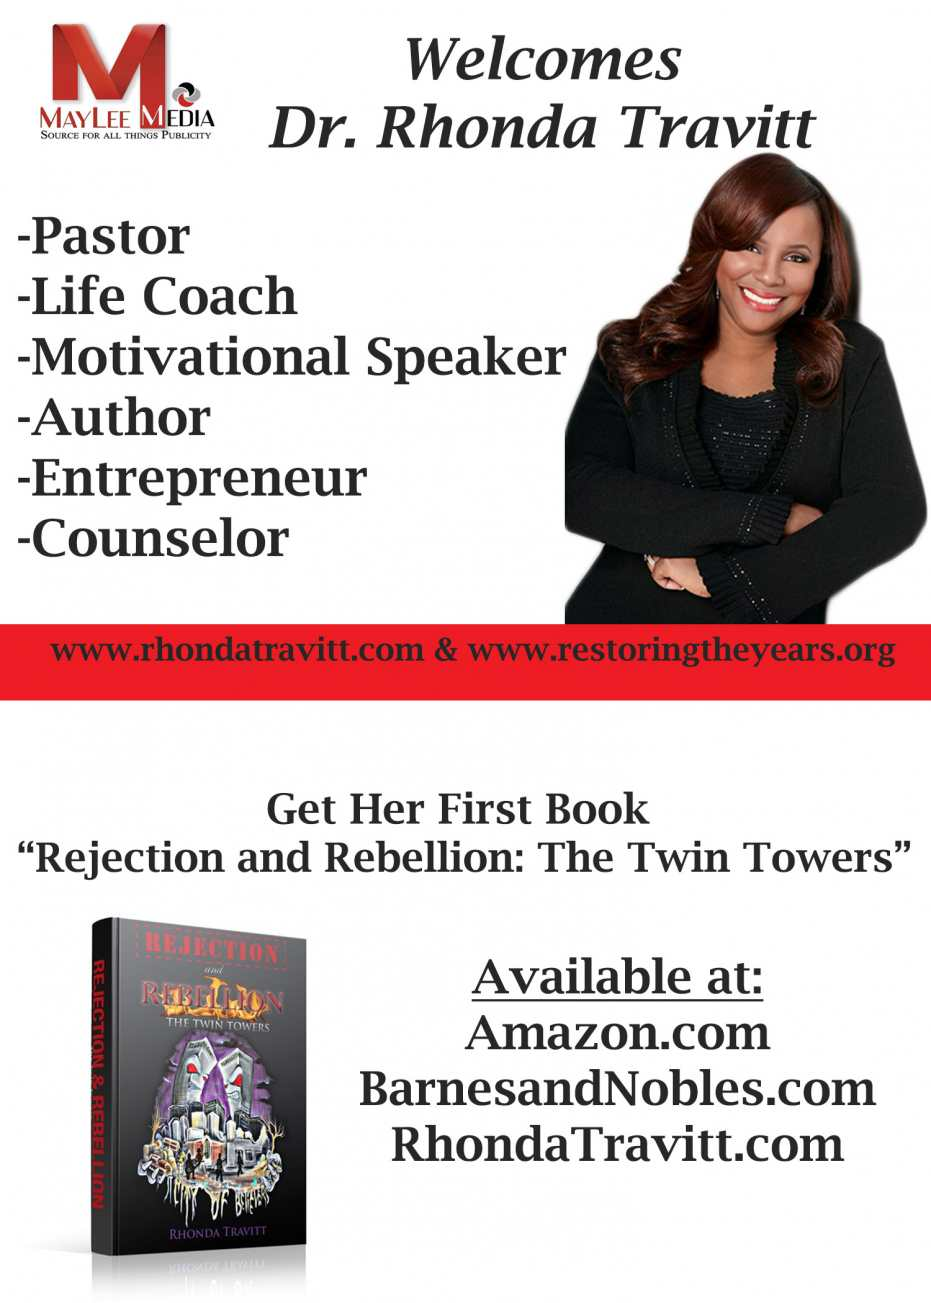 Rhonda Travitt (1) Welcome Flyer